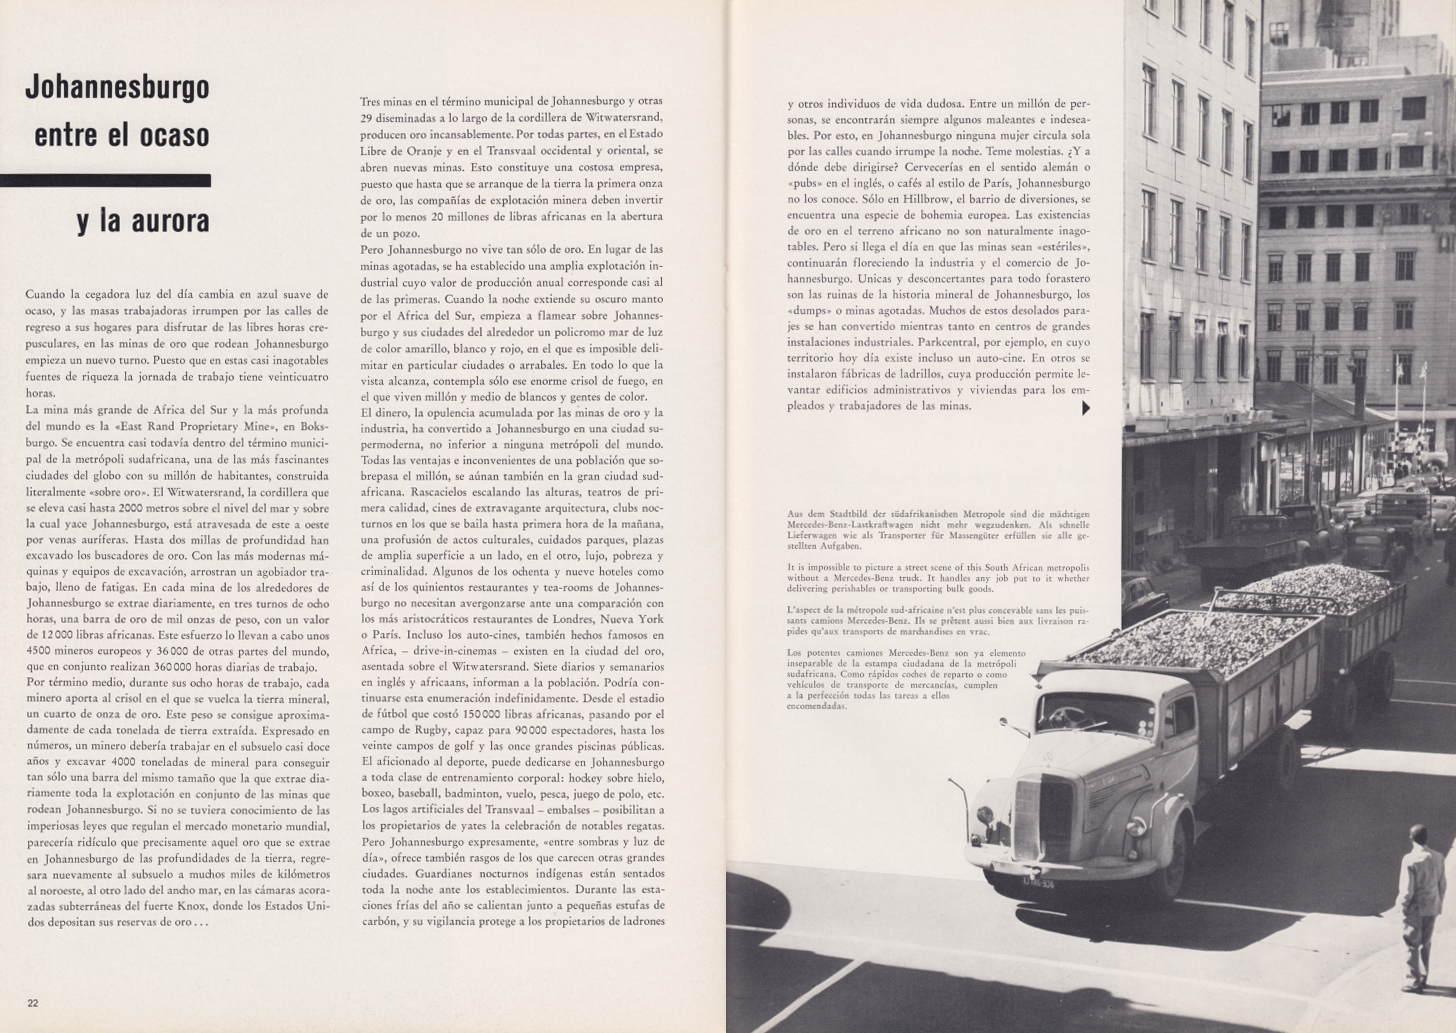 (REVISTA): Periódico In aller welt n.º 34 - Mercedes-Benz no mundo - 1959 - multilingue 012